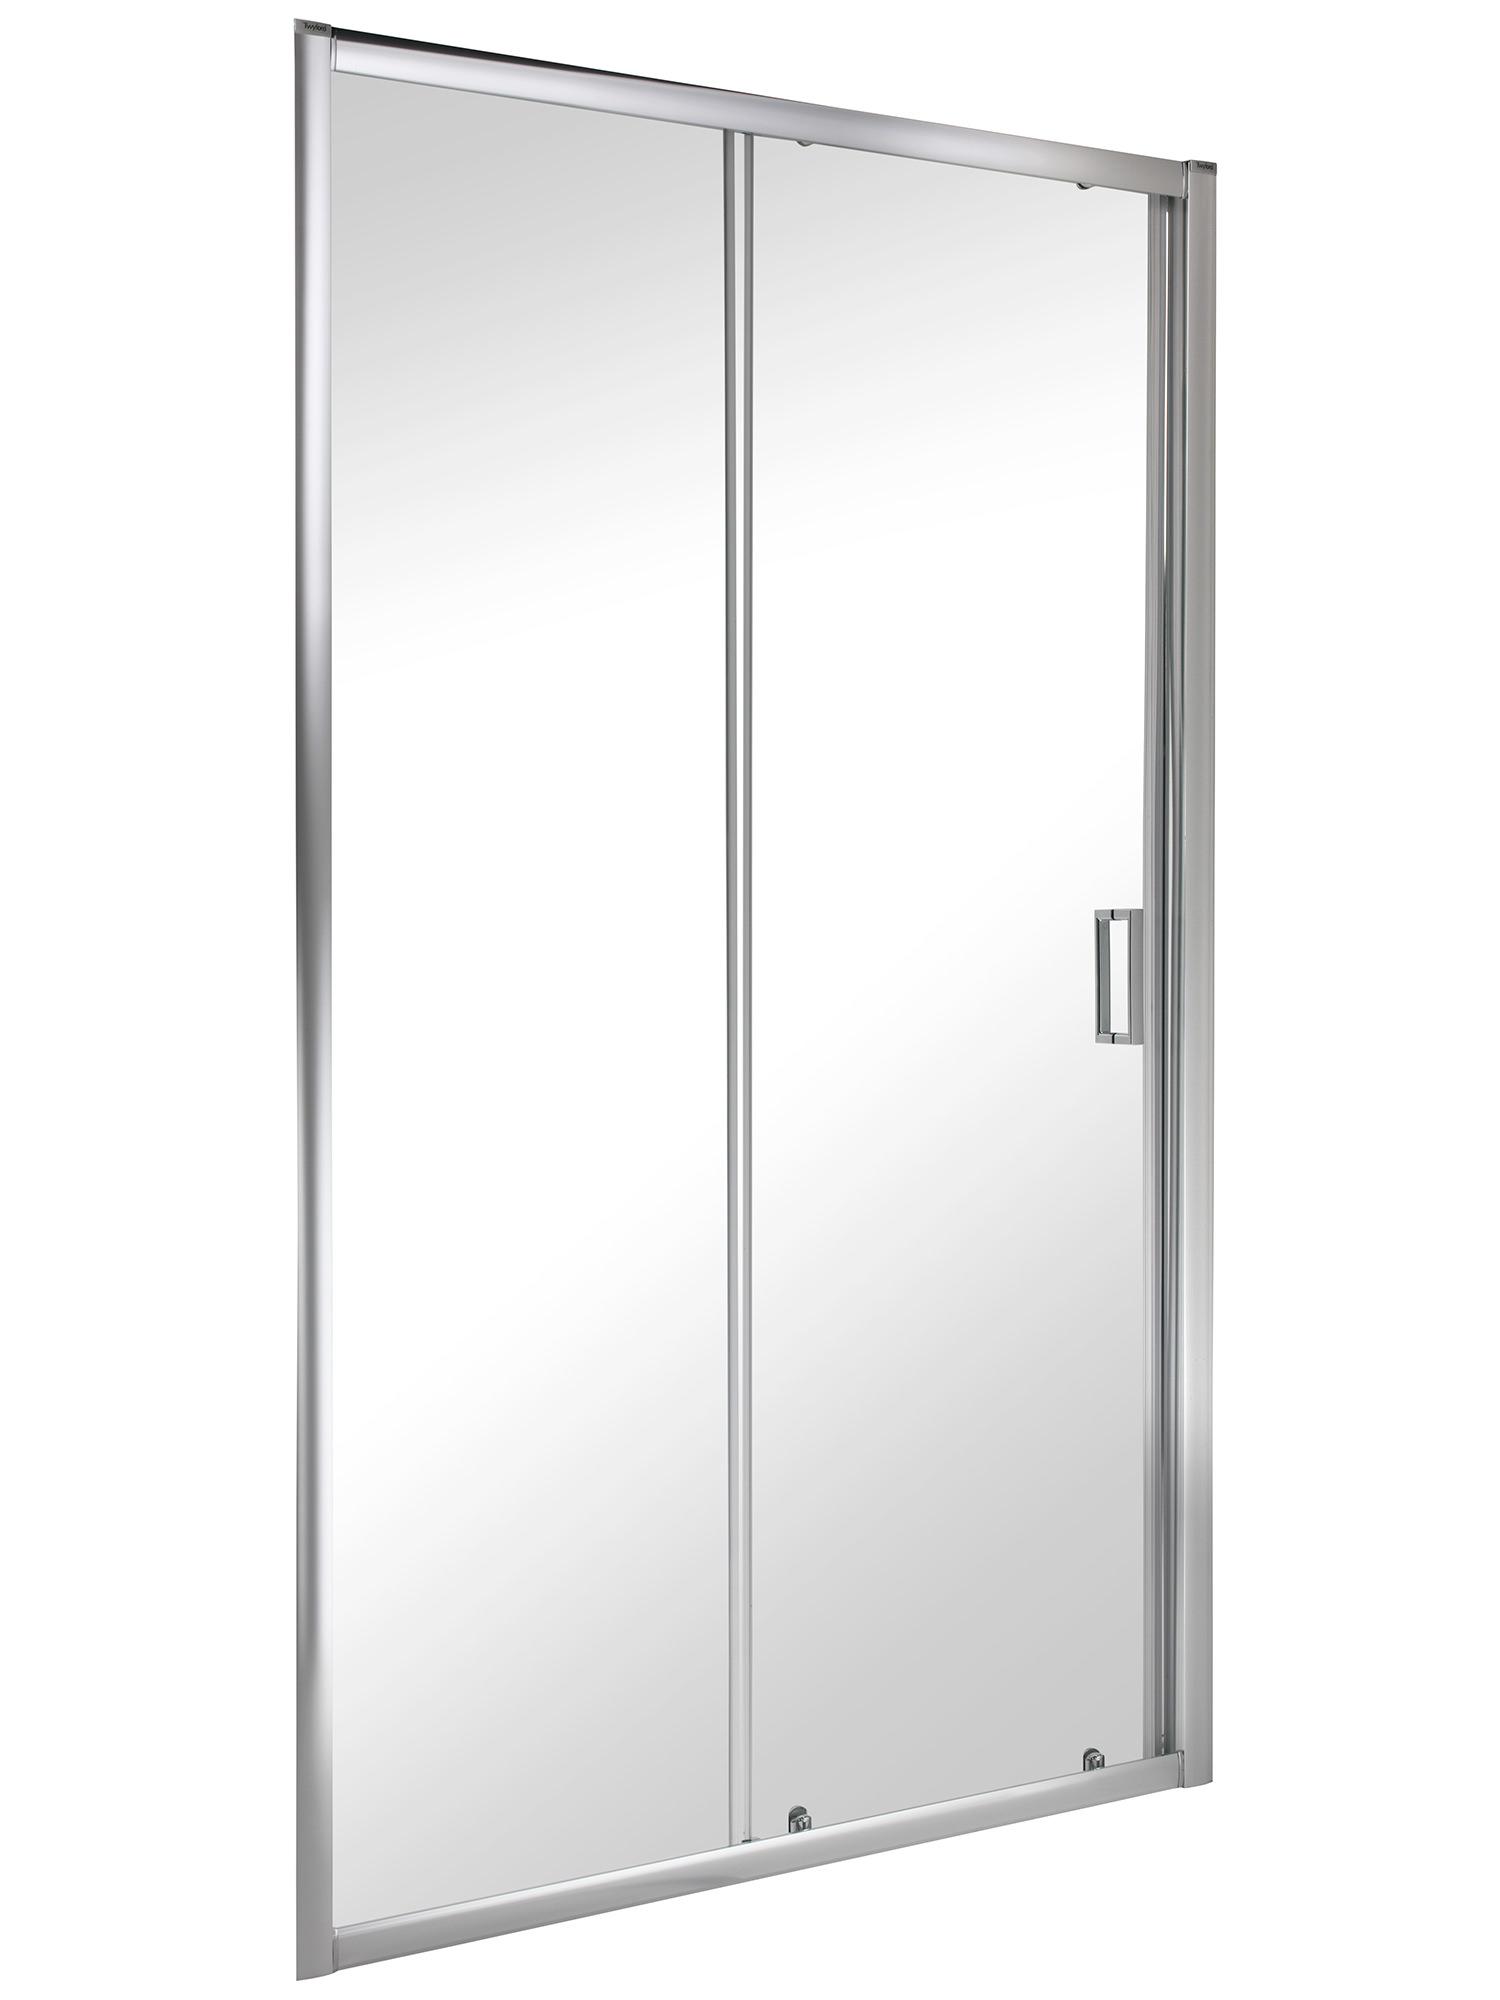 Twyford es200 1000mm sliding shower enclosure door for 1000mm door